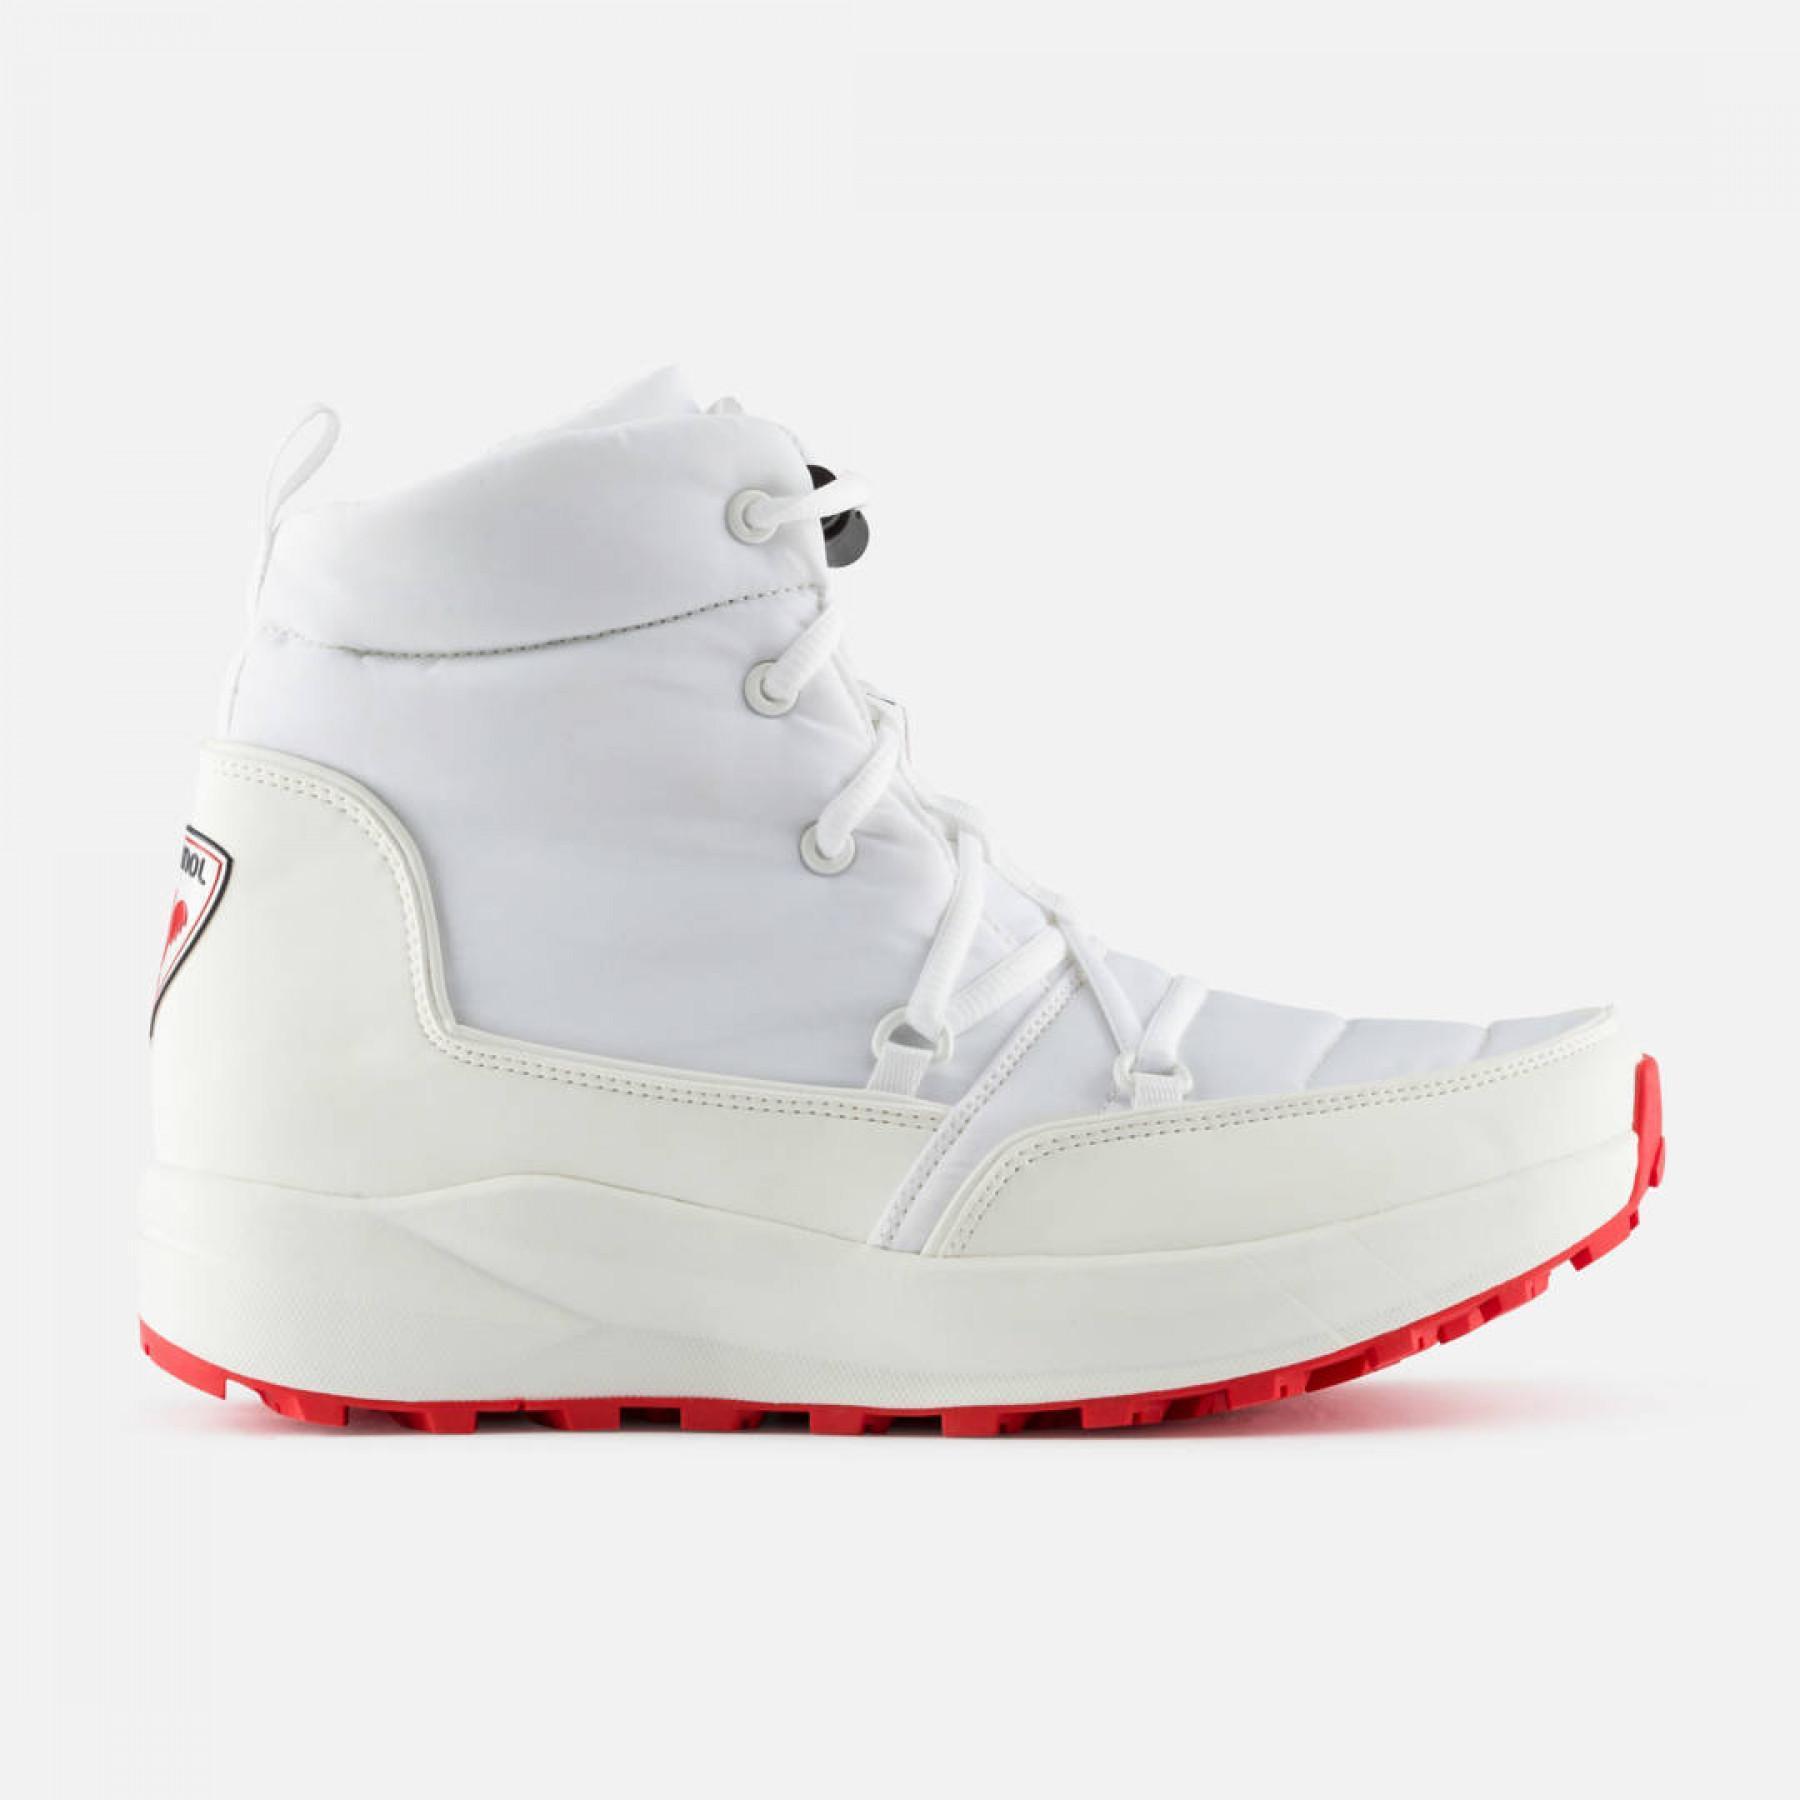 Apres-ski shoes Rossignol